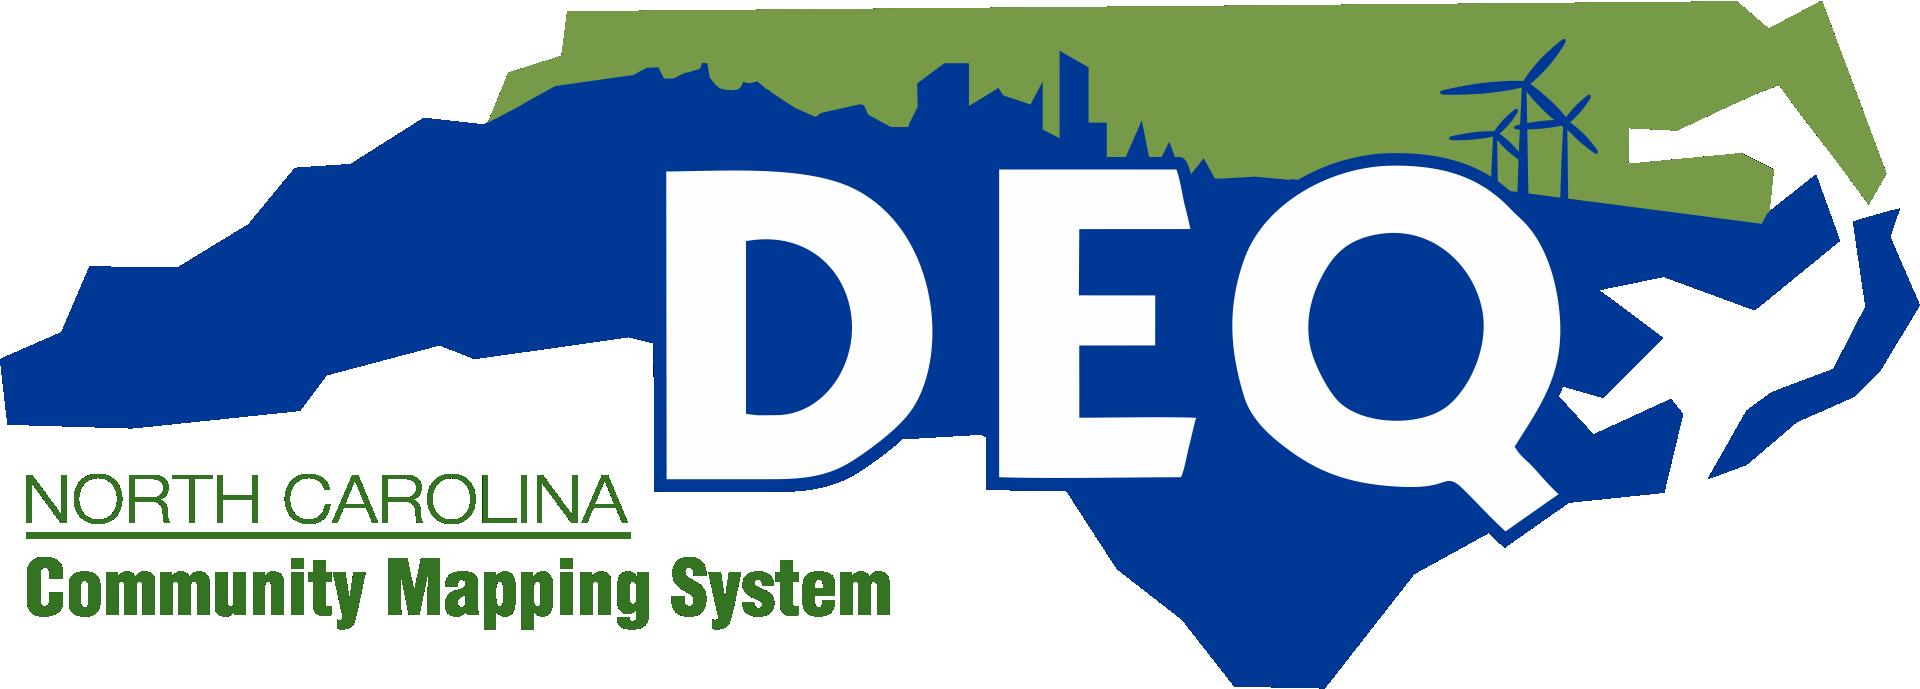 DEQ NC Community Mapping System